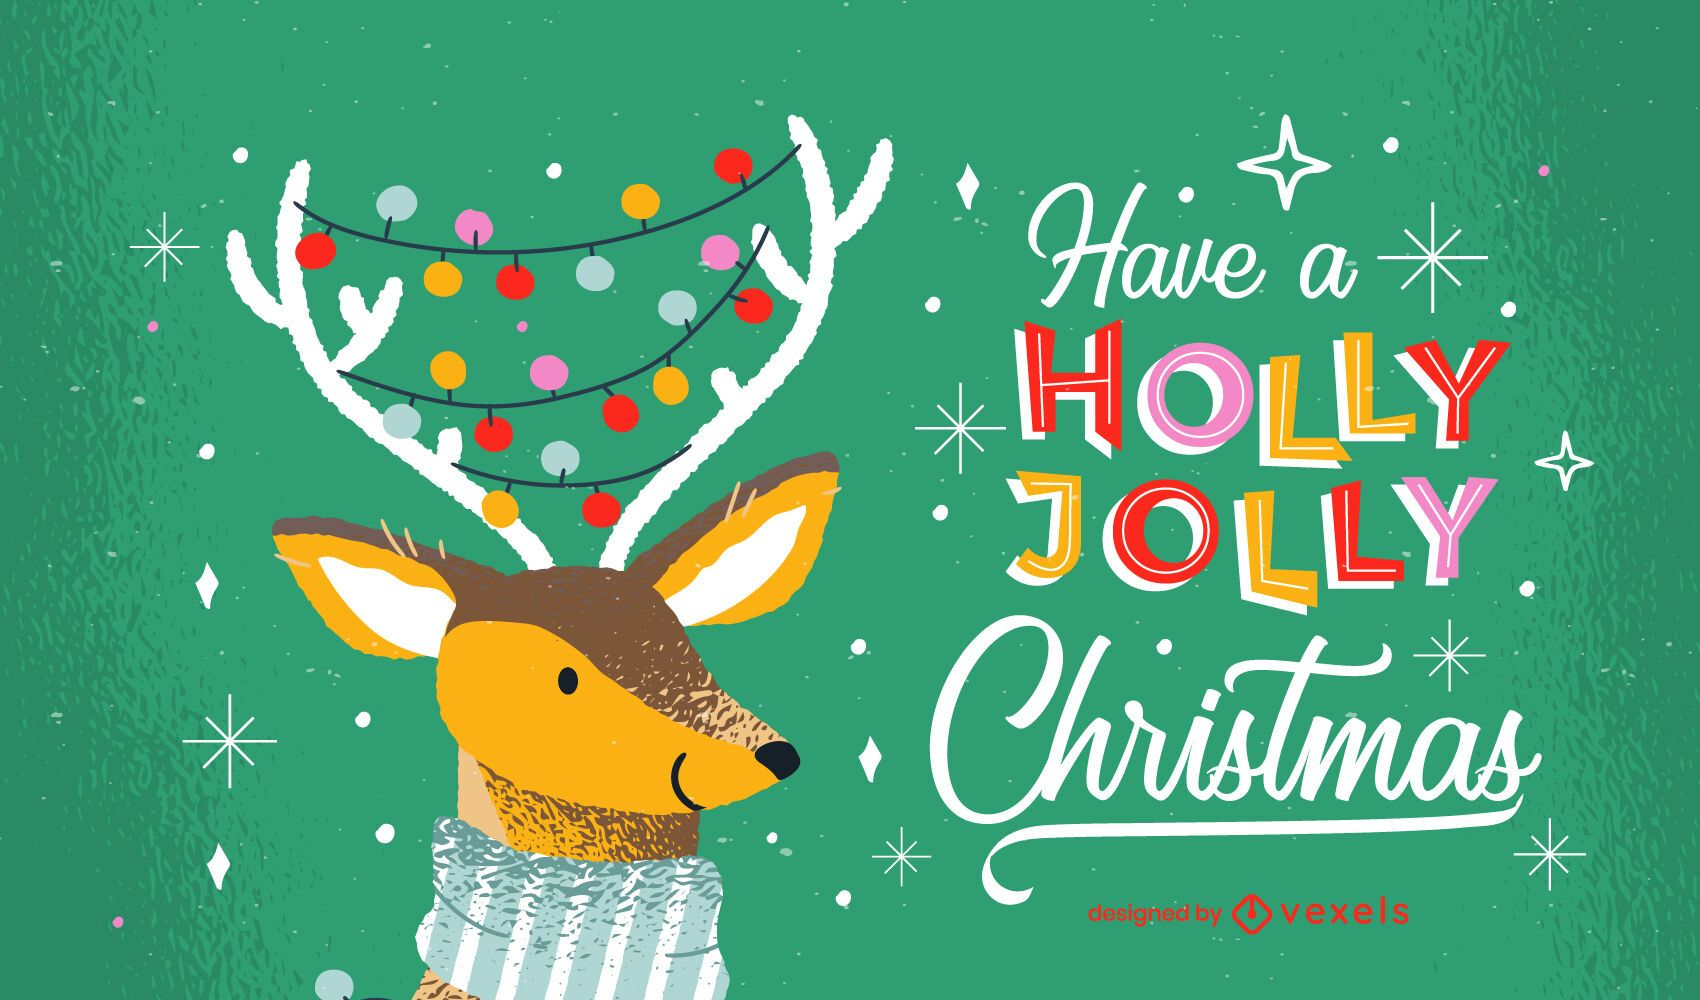 Diseño de letras navideñas holly jolly